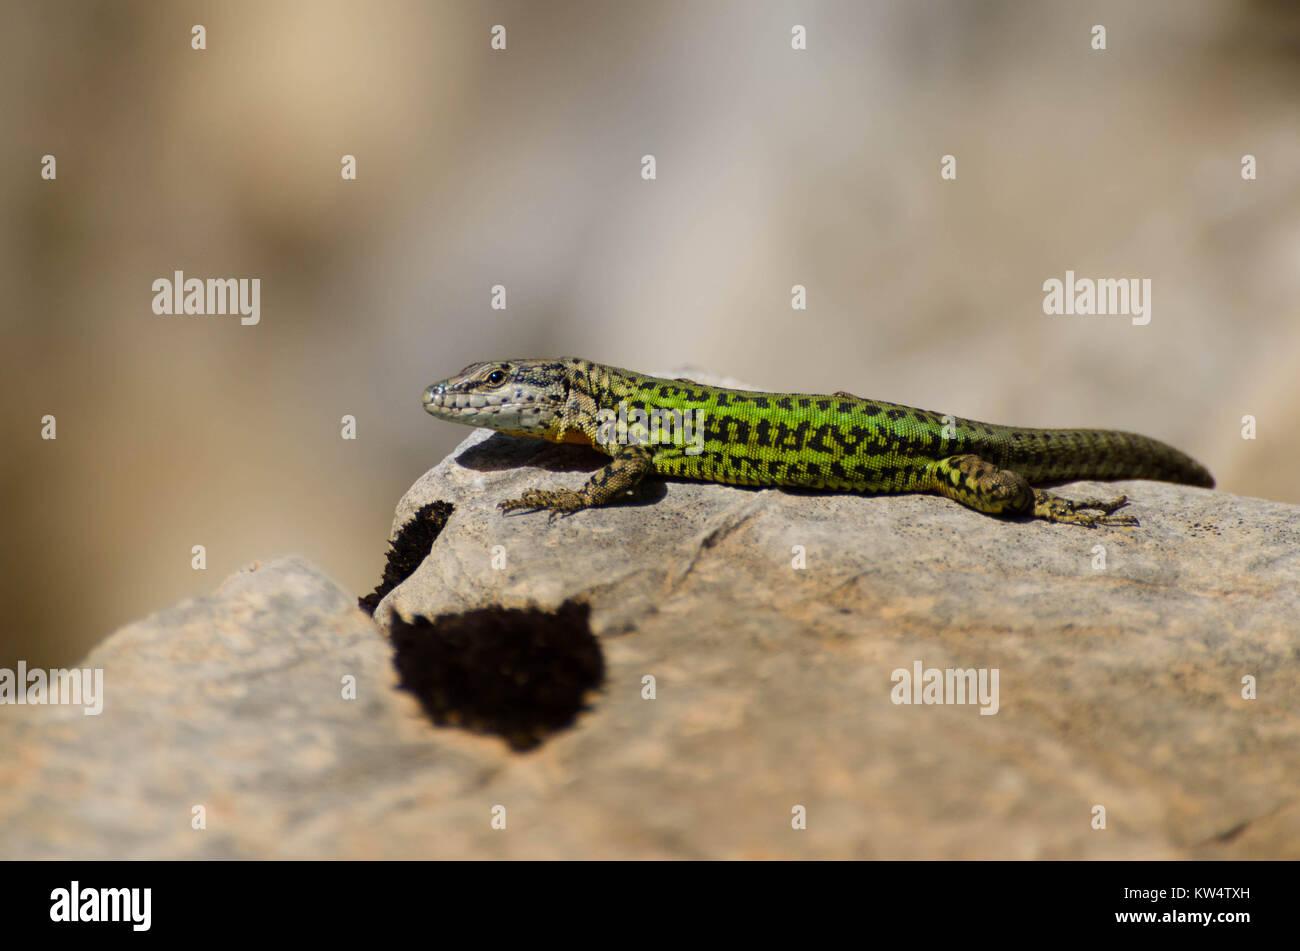 An Iberian wall lizard suns itself on a rock in Morocco - Stock Image